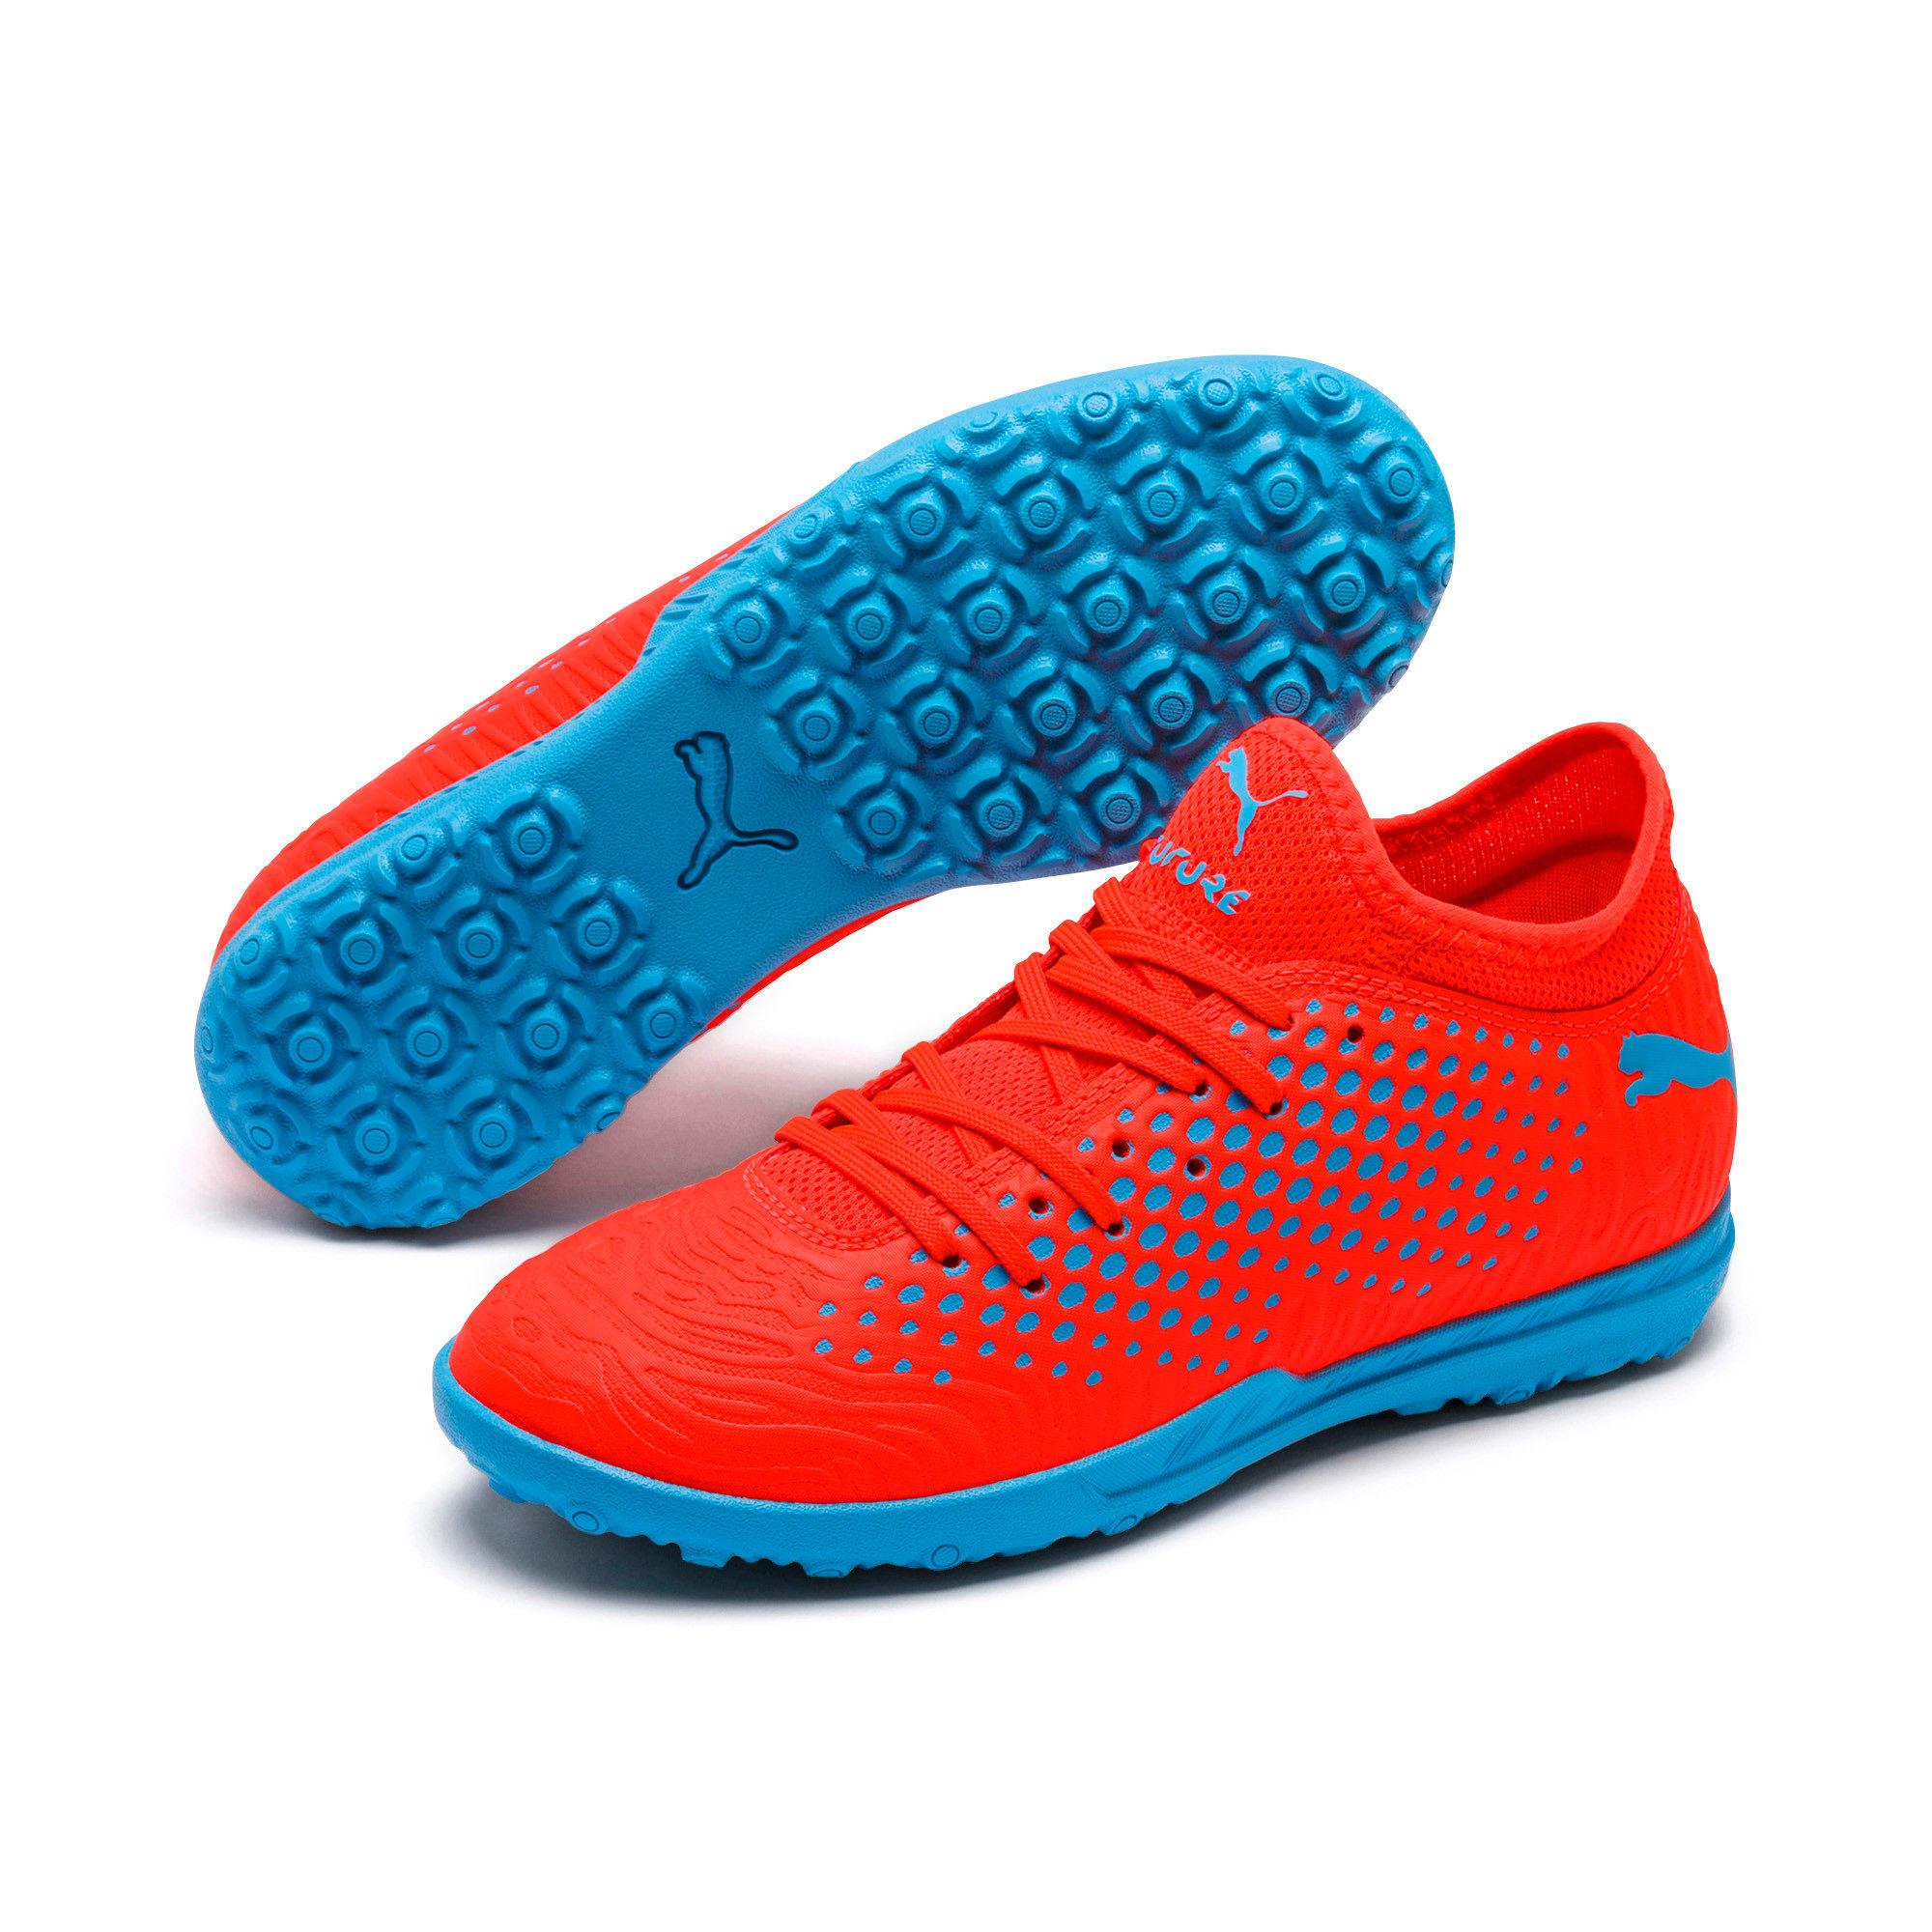 Thumbnail 2 of FUTURE 19.4 TT Soccer Shoes JR, Red Blast-Bleu Azur, medium